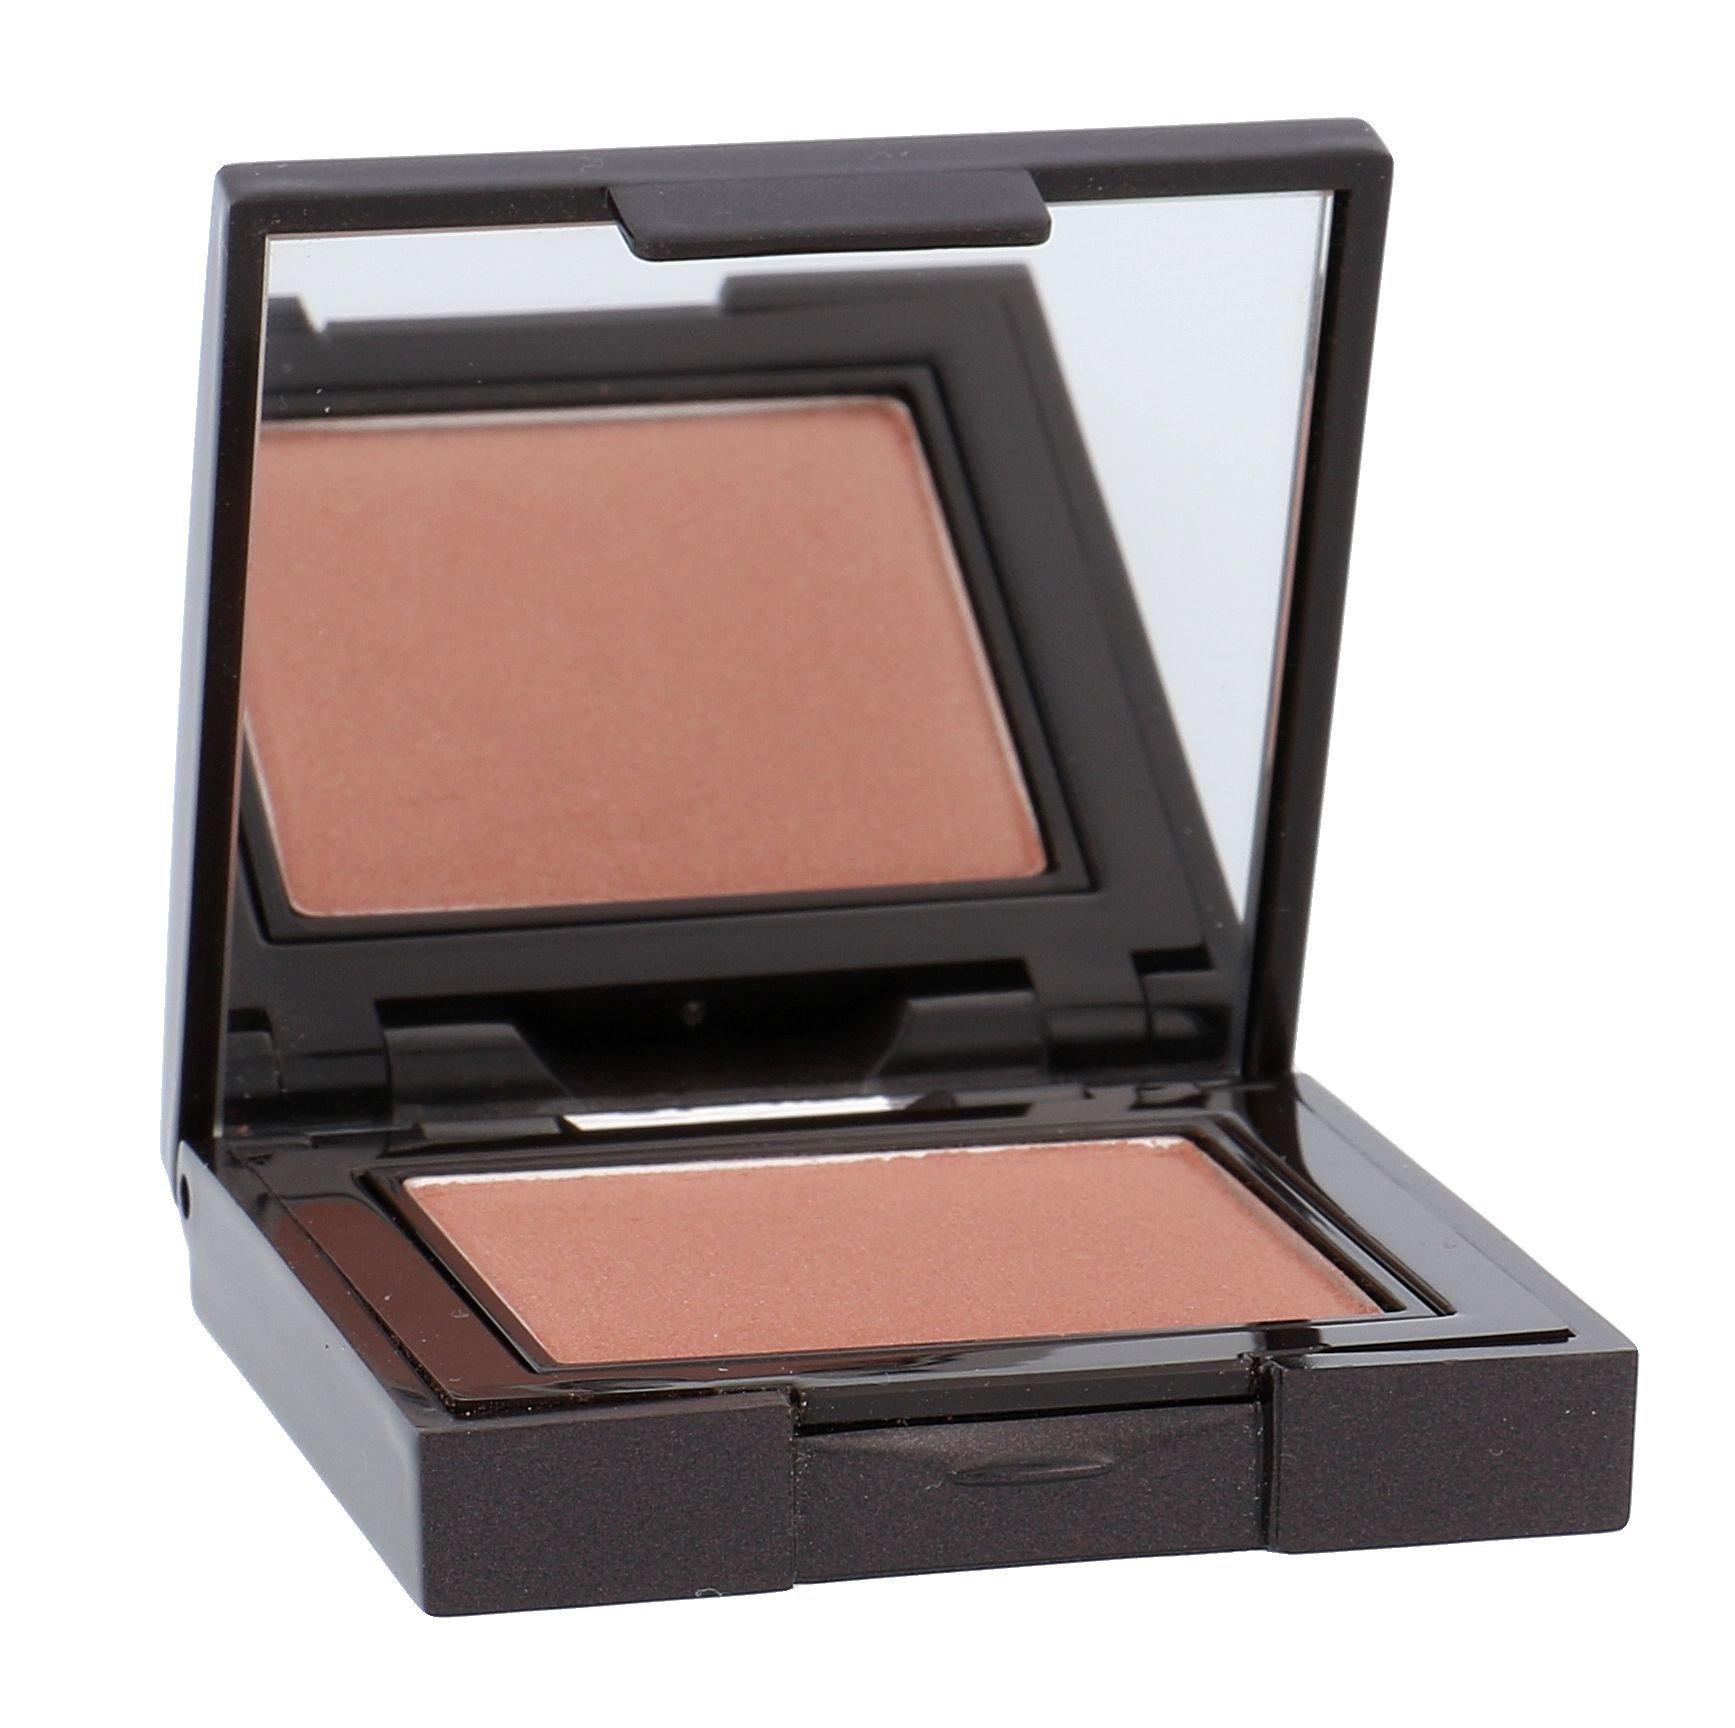 Laura Mercier Second Skin Cheek Colour Cosmetic 3,6ml Winter Bloom